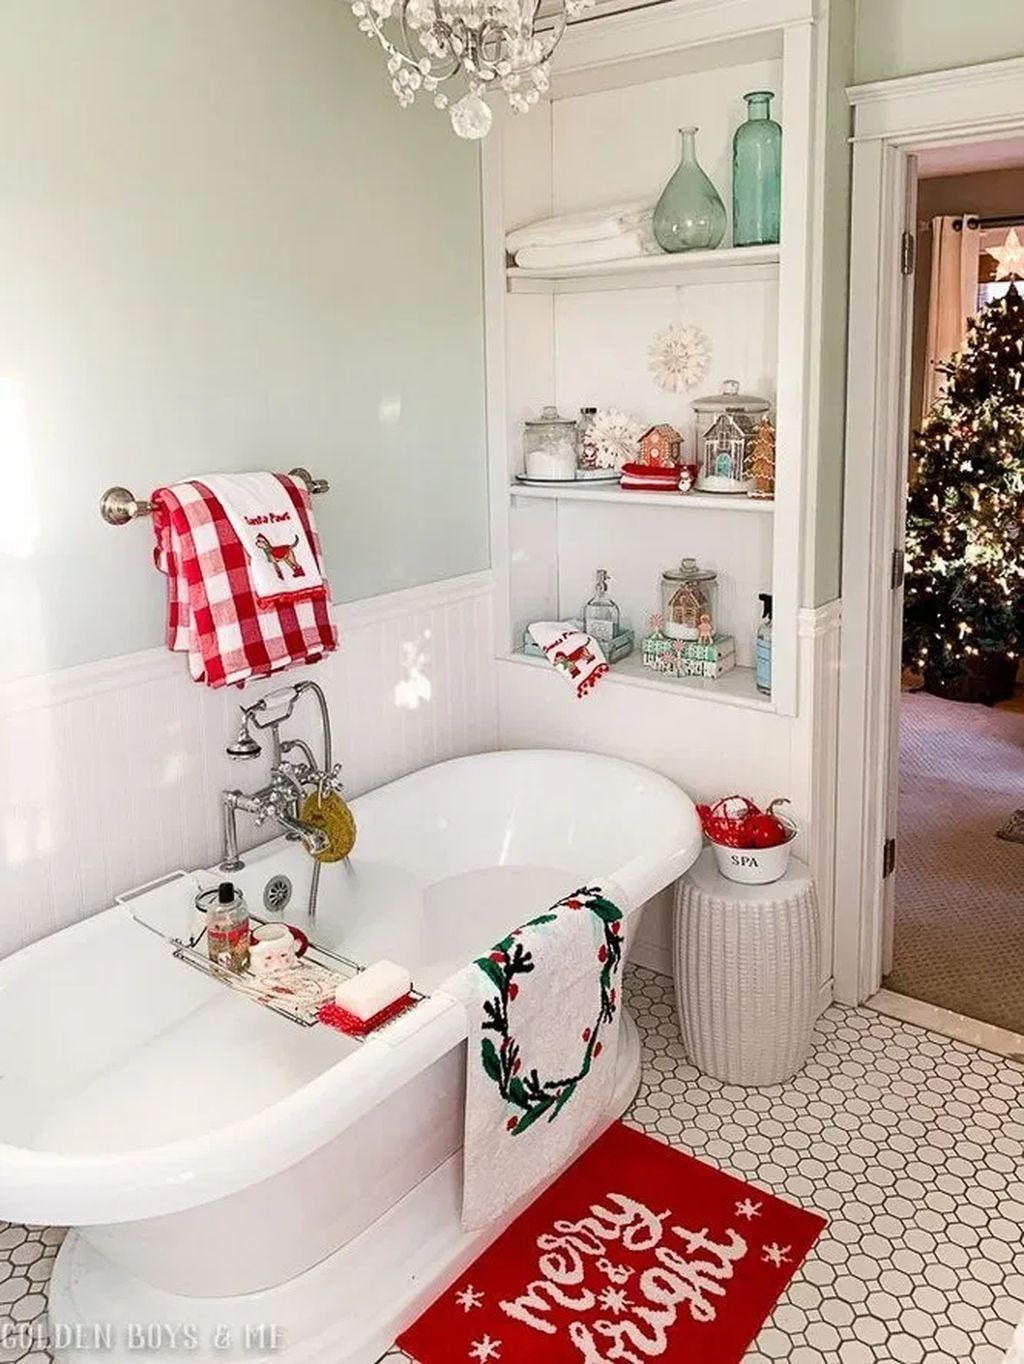 31 Brilliant Christmas Bathroom Decoration Ideas That Looks So Simple Christmas Bathroom Decor Christmas Bathroom Christmas Decor Ideas For Bedroom Farmhouse christmas bathroom decor